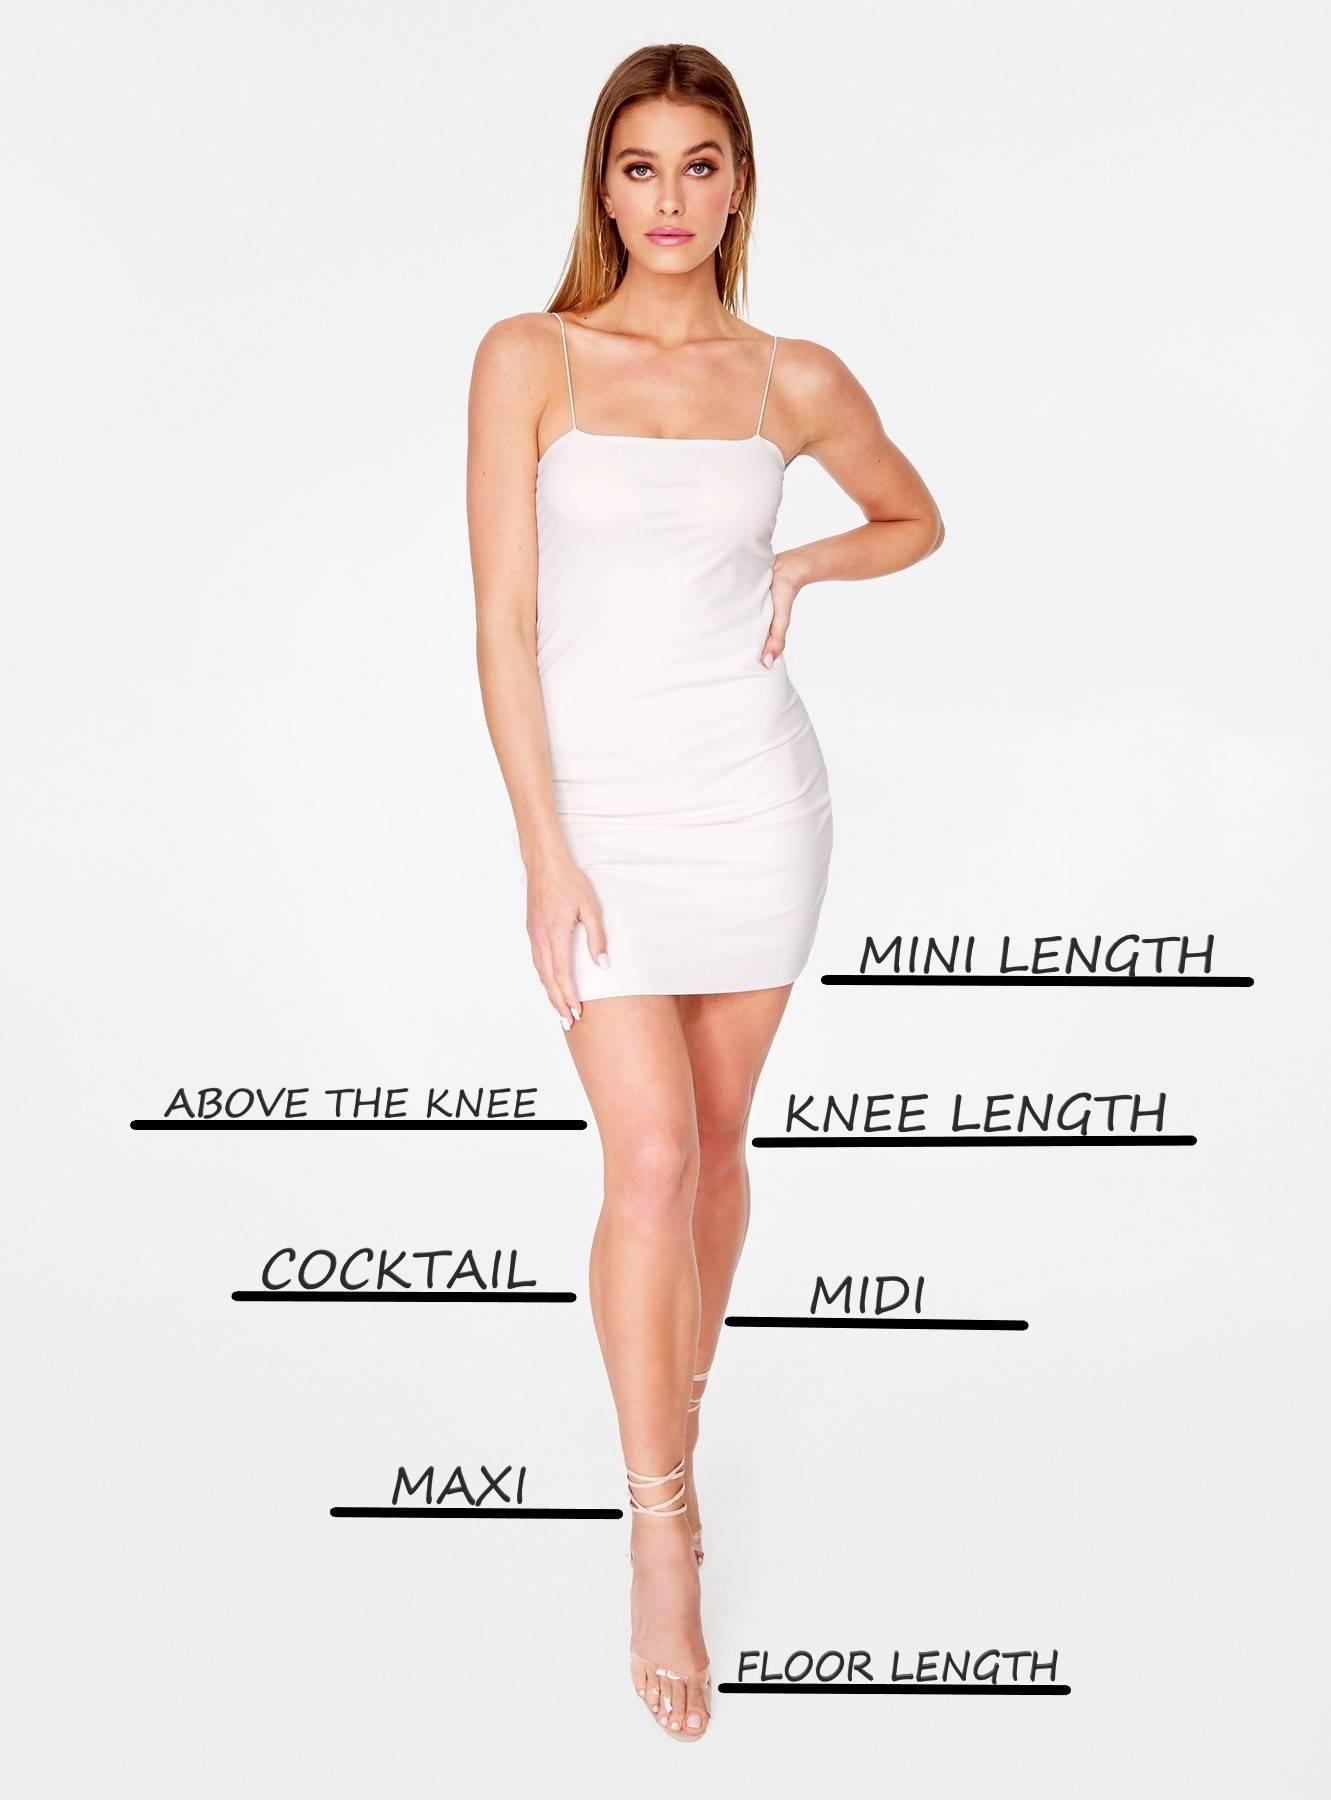 Midi Dress Definition